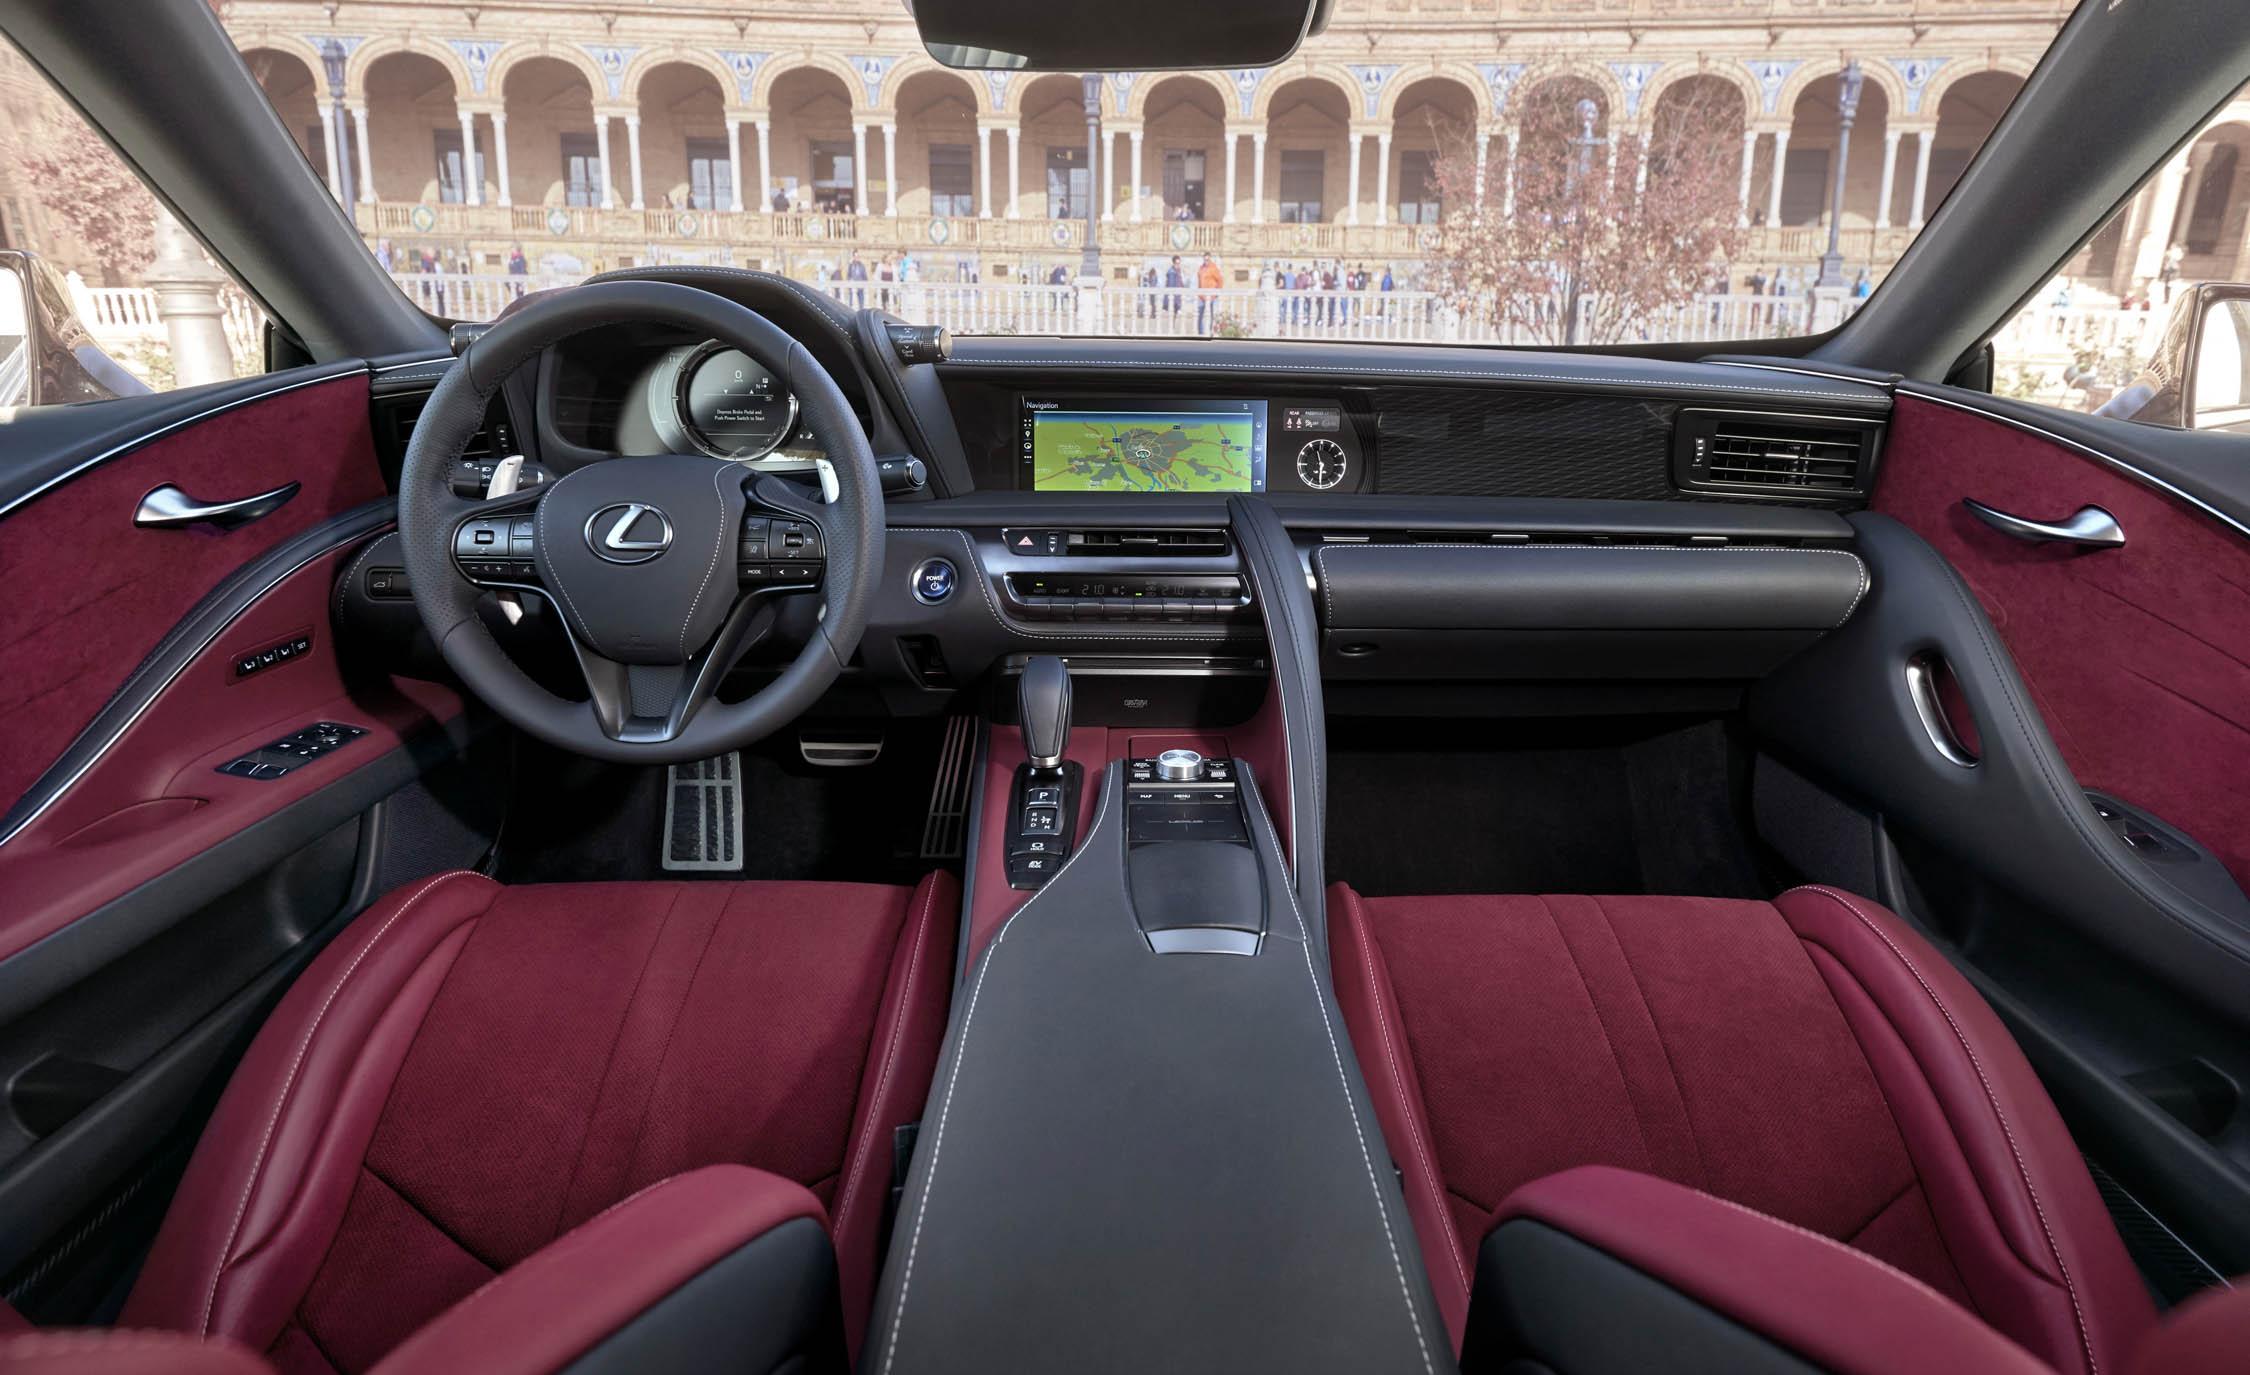 2018 Lexus Lc 500h Interior Dashboard (Photo 37 of 84)